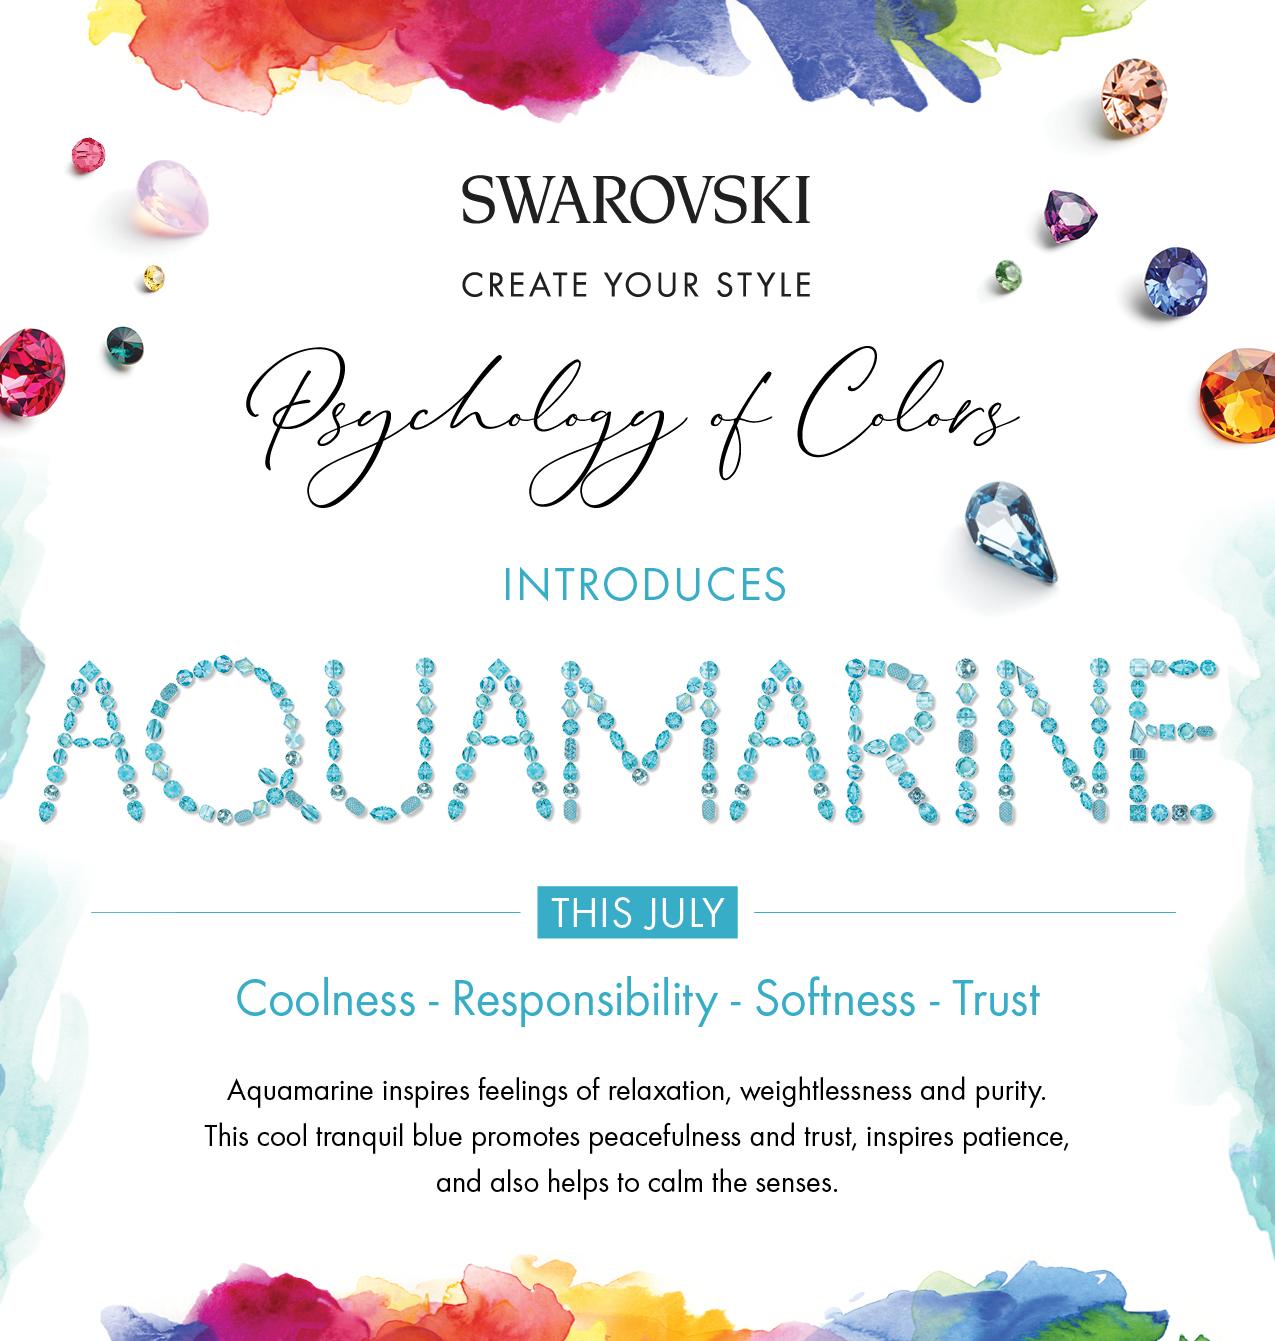 sw-poc-newsletter-aquamarine-generic.jpg